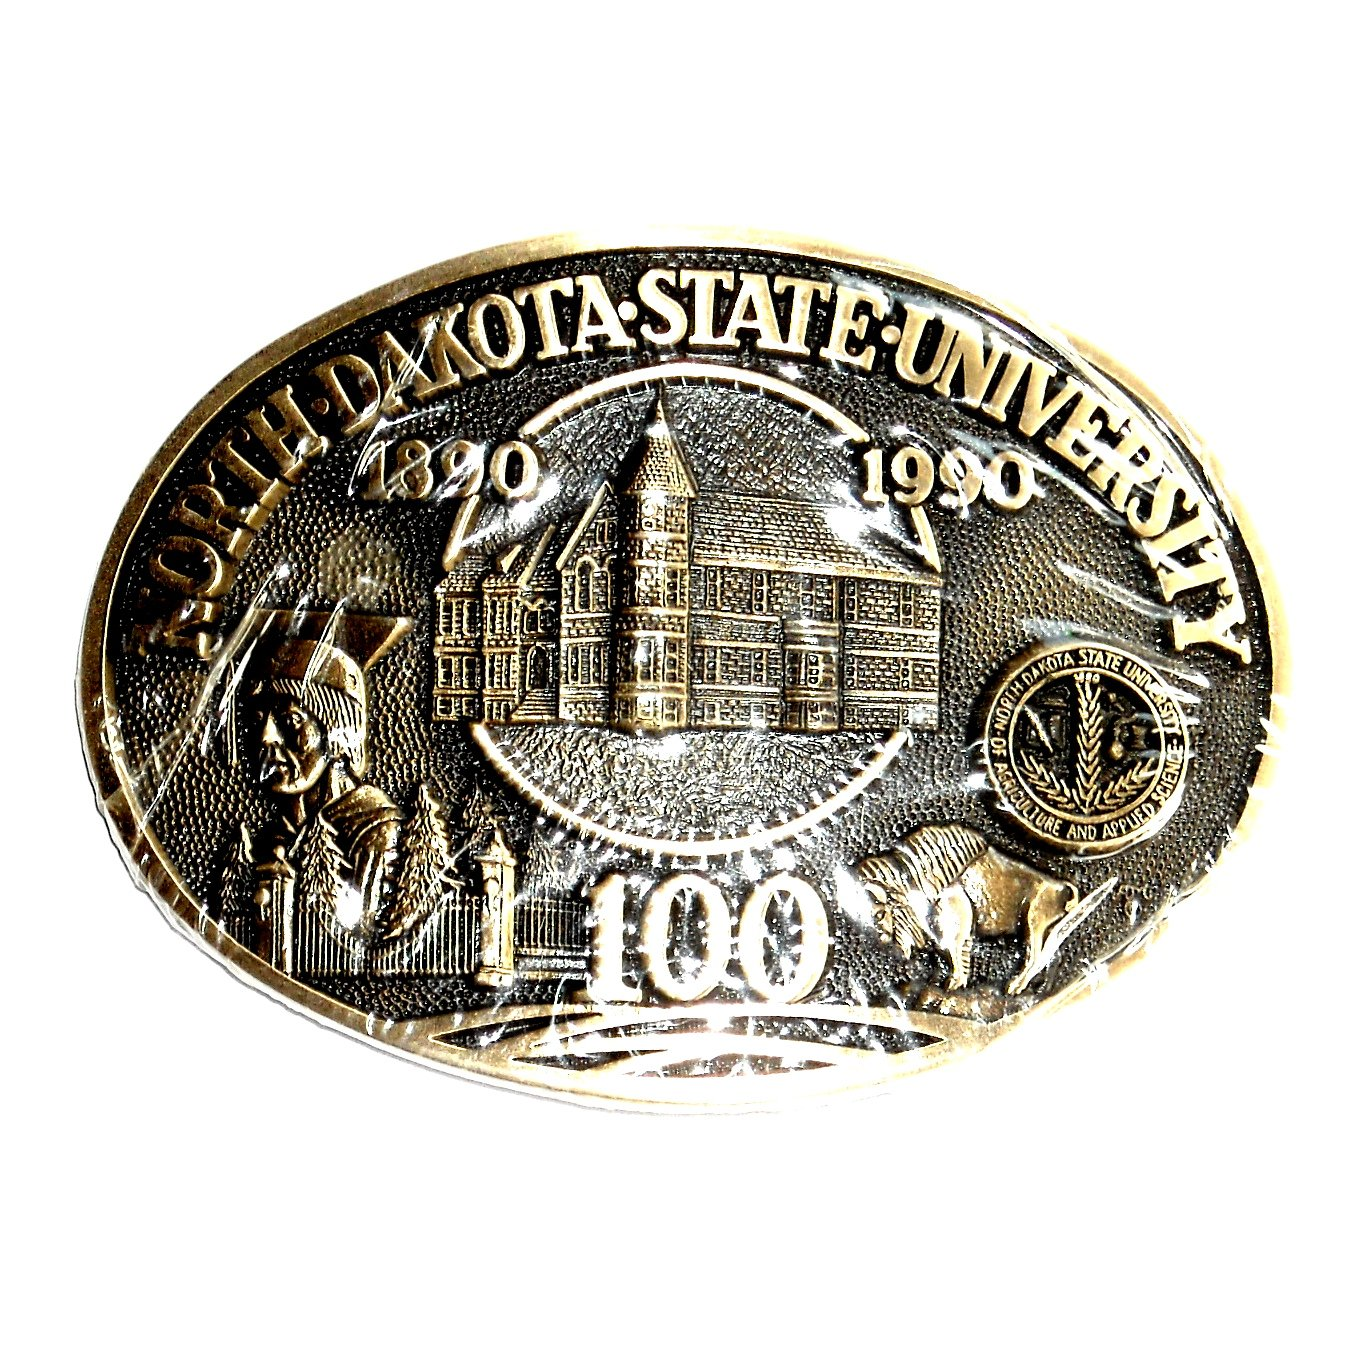 North Dakota State University Award Design Solid Brass Belt Buckle